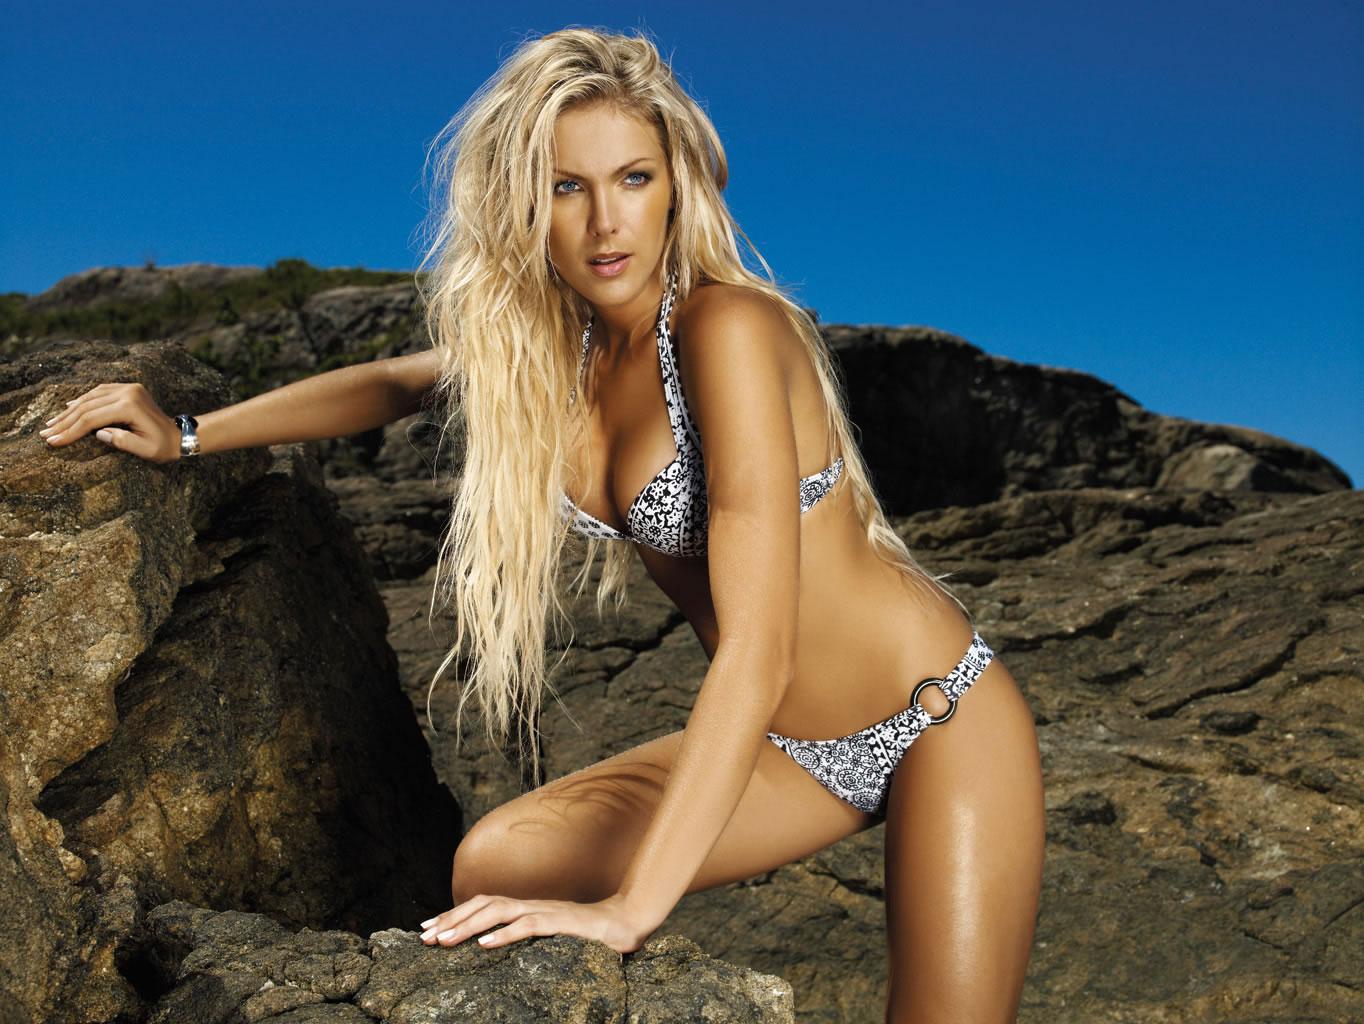 http://3.bp.blogspot.com/-LqVGmg-105s/TbLK94hryNI/AAAAAAAACwE/U71RrOrTSYY/s1600/ana-hickman-bikini-swimwear-6.jpg